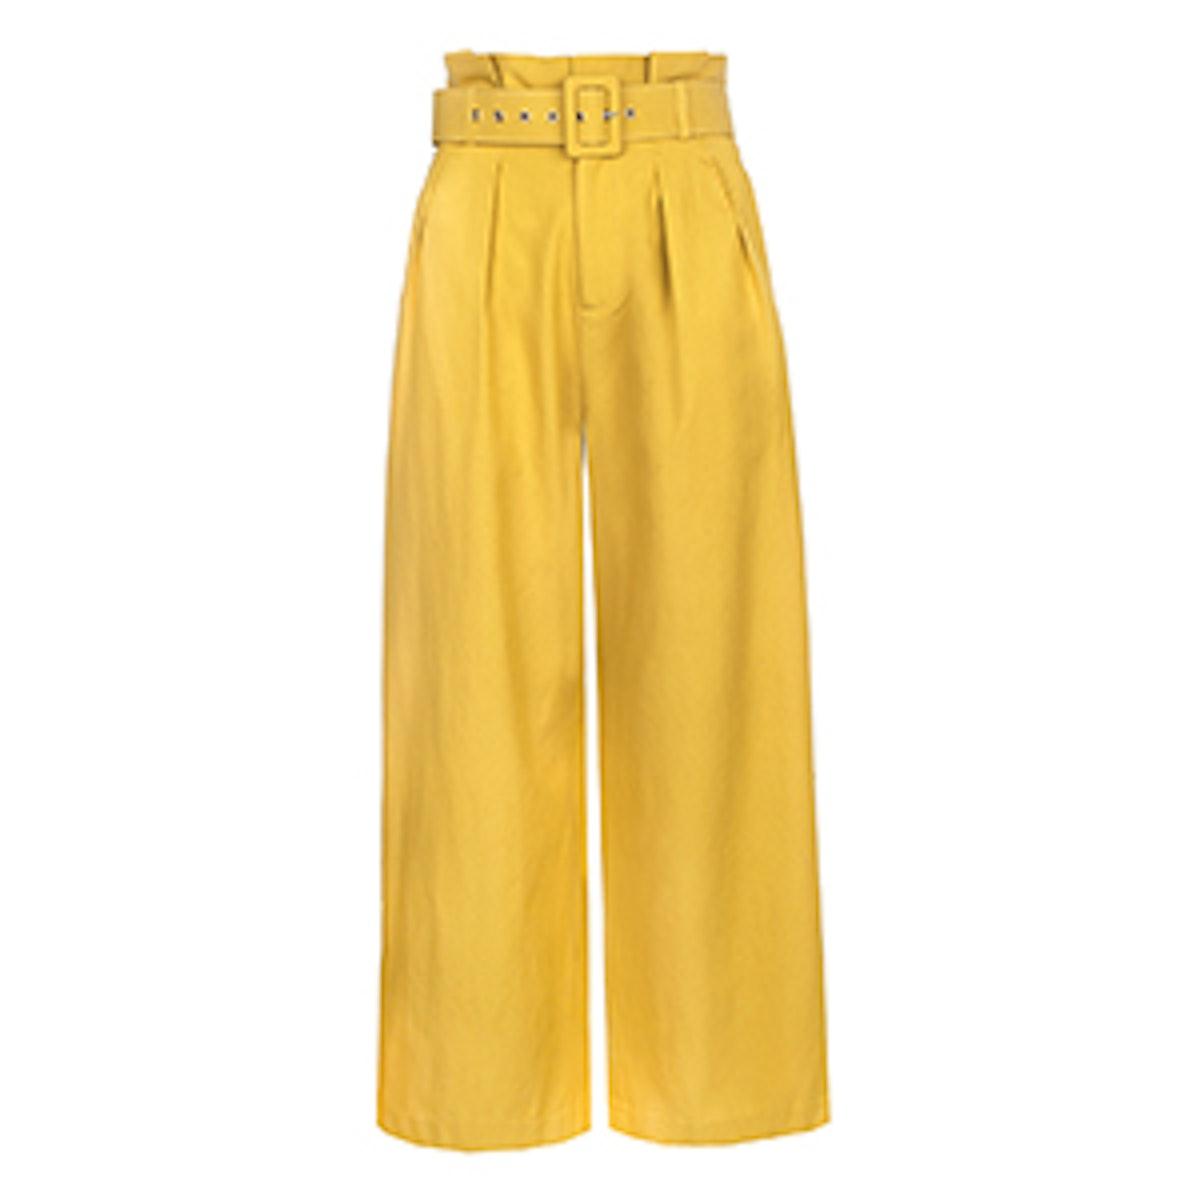 Paperbag Belted Waist Pants